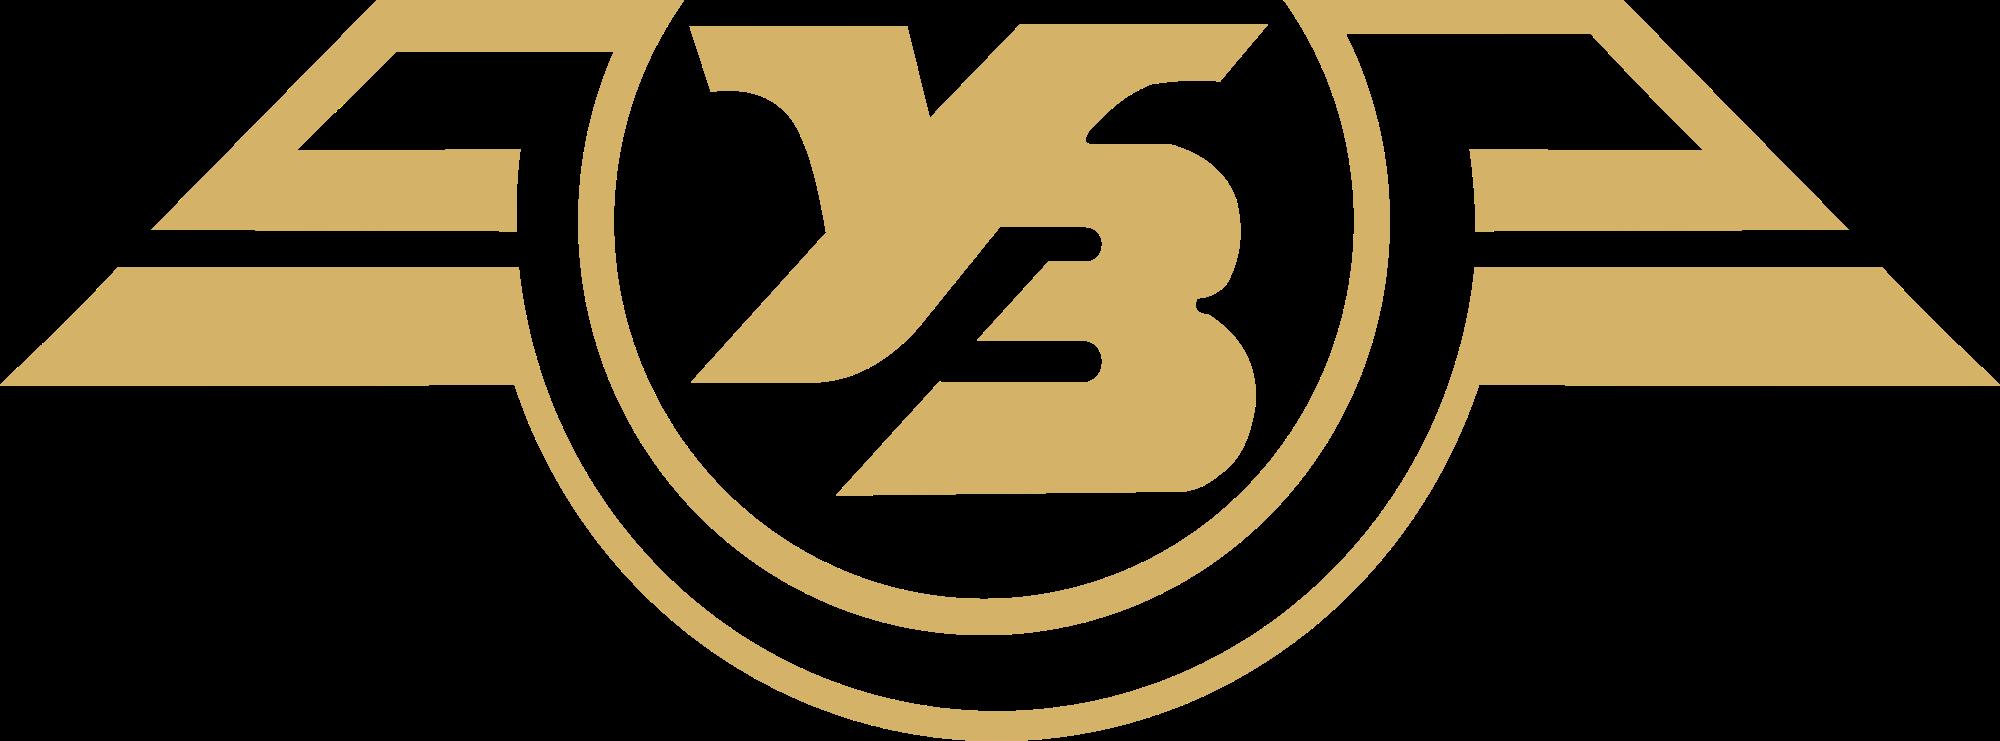 старий логотип уз